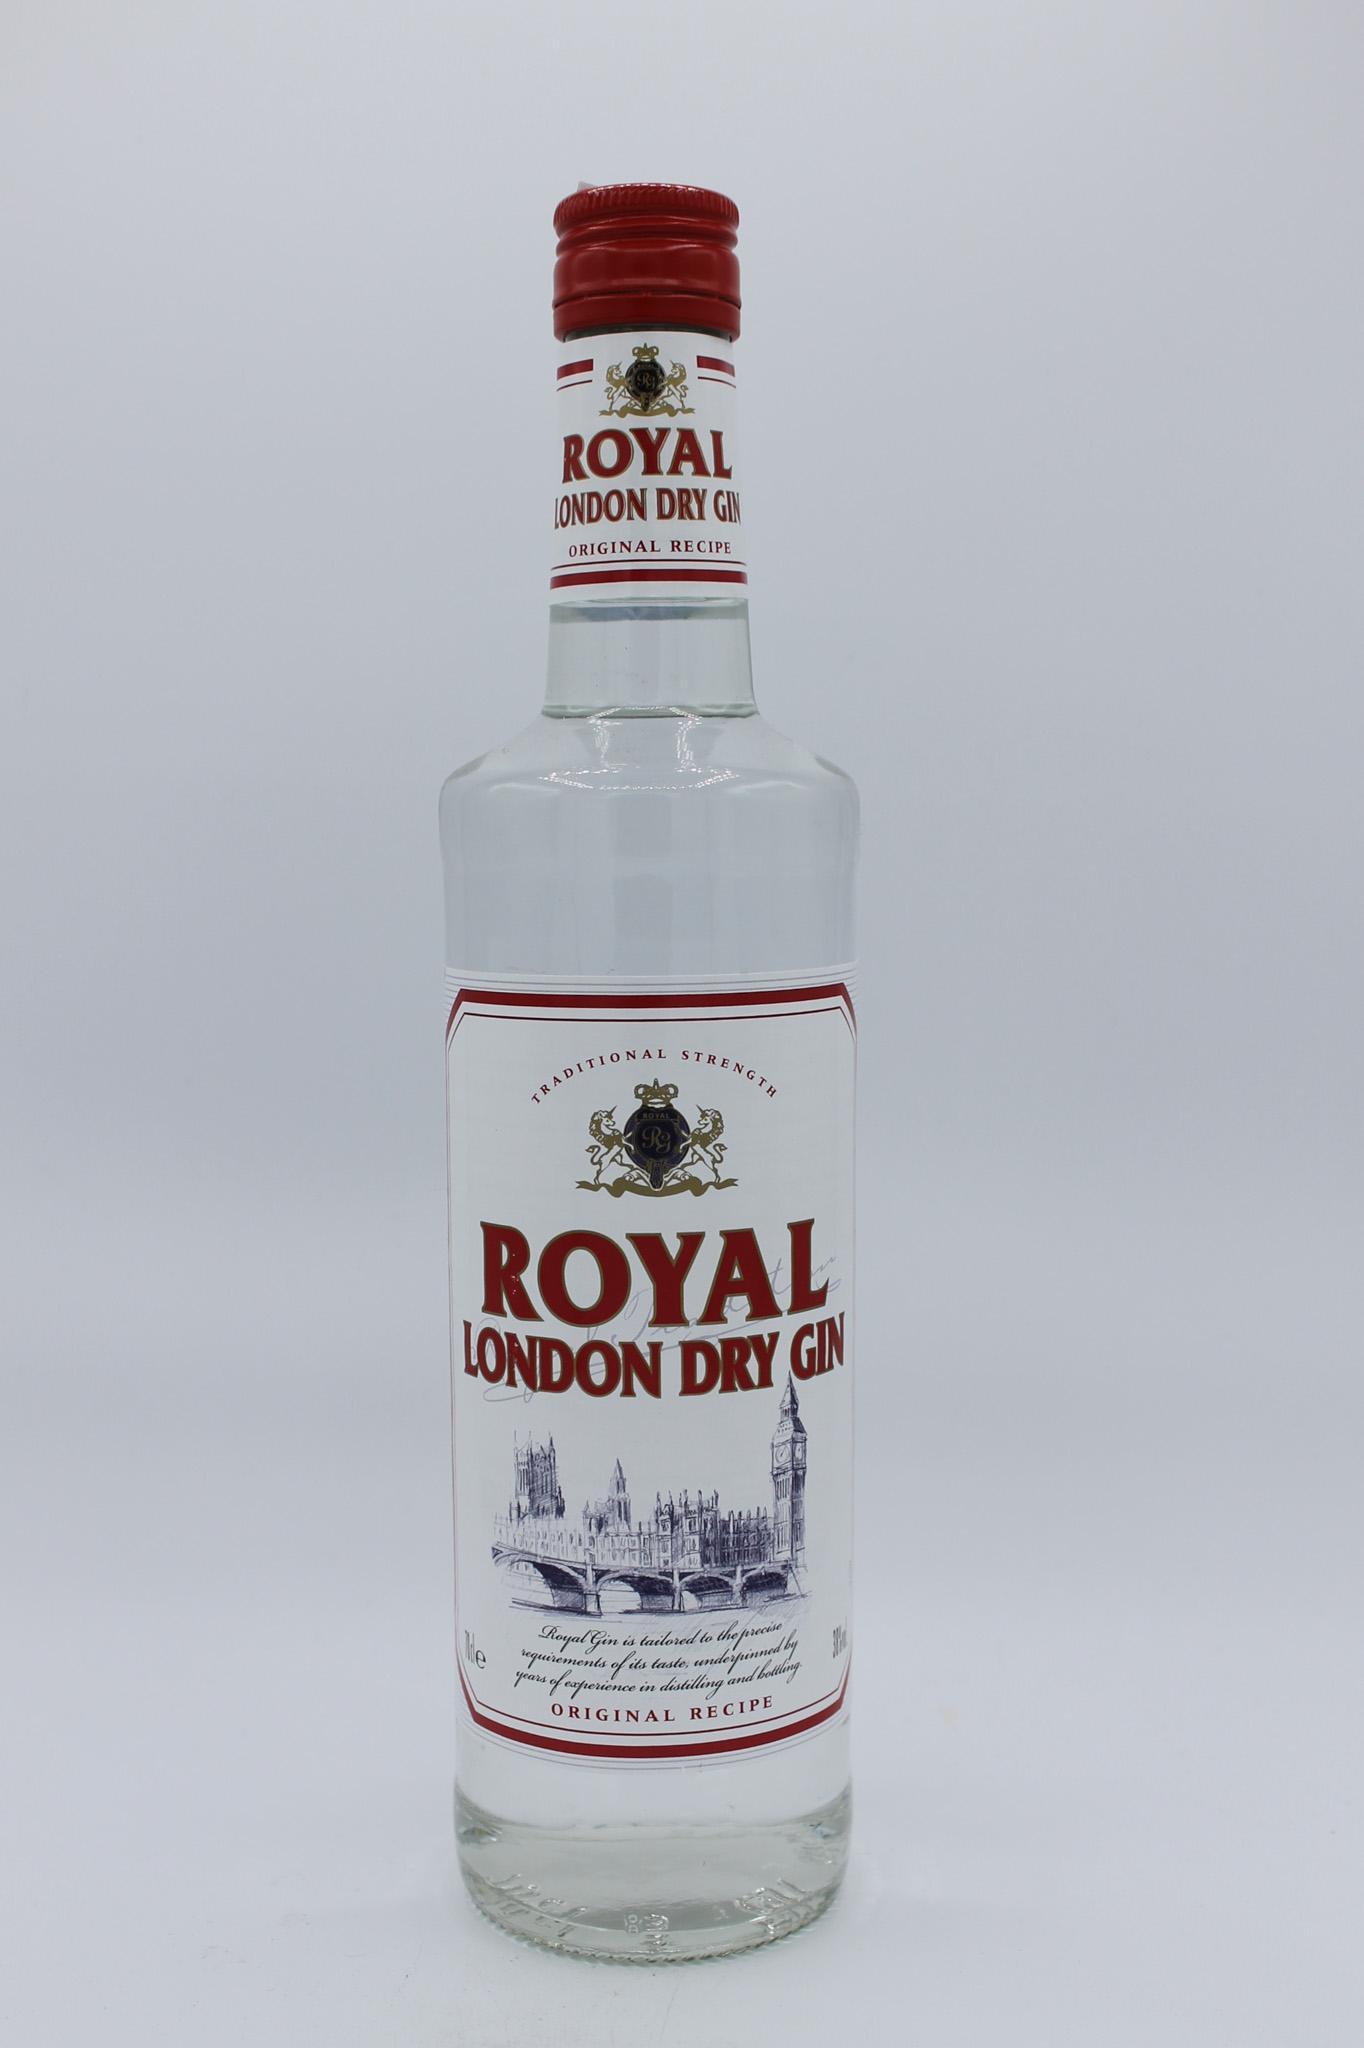 Royal london dry gin 700ml.